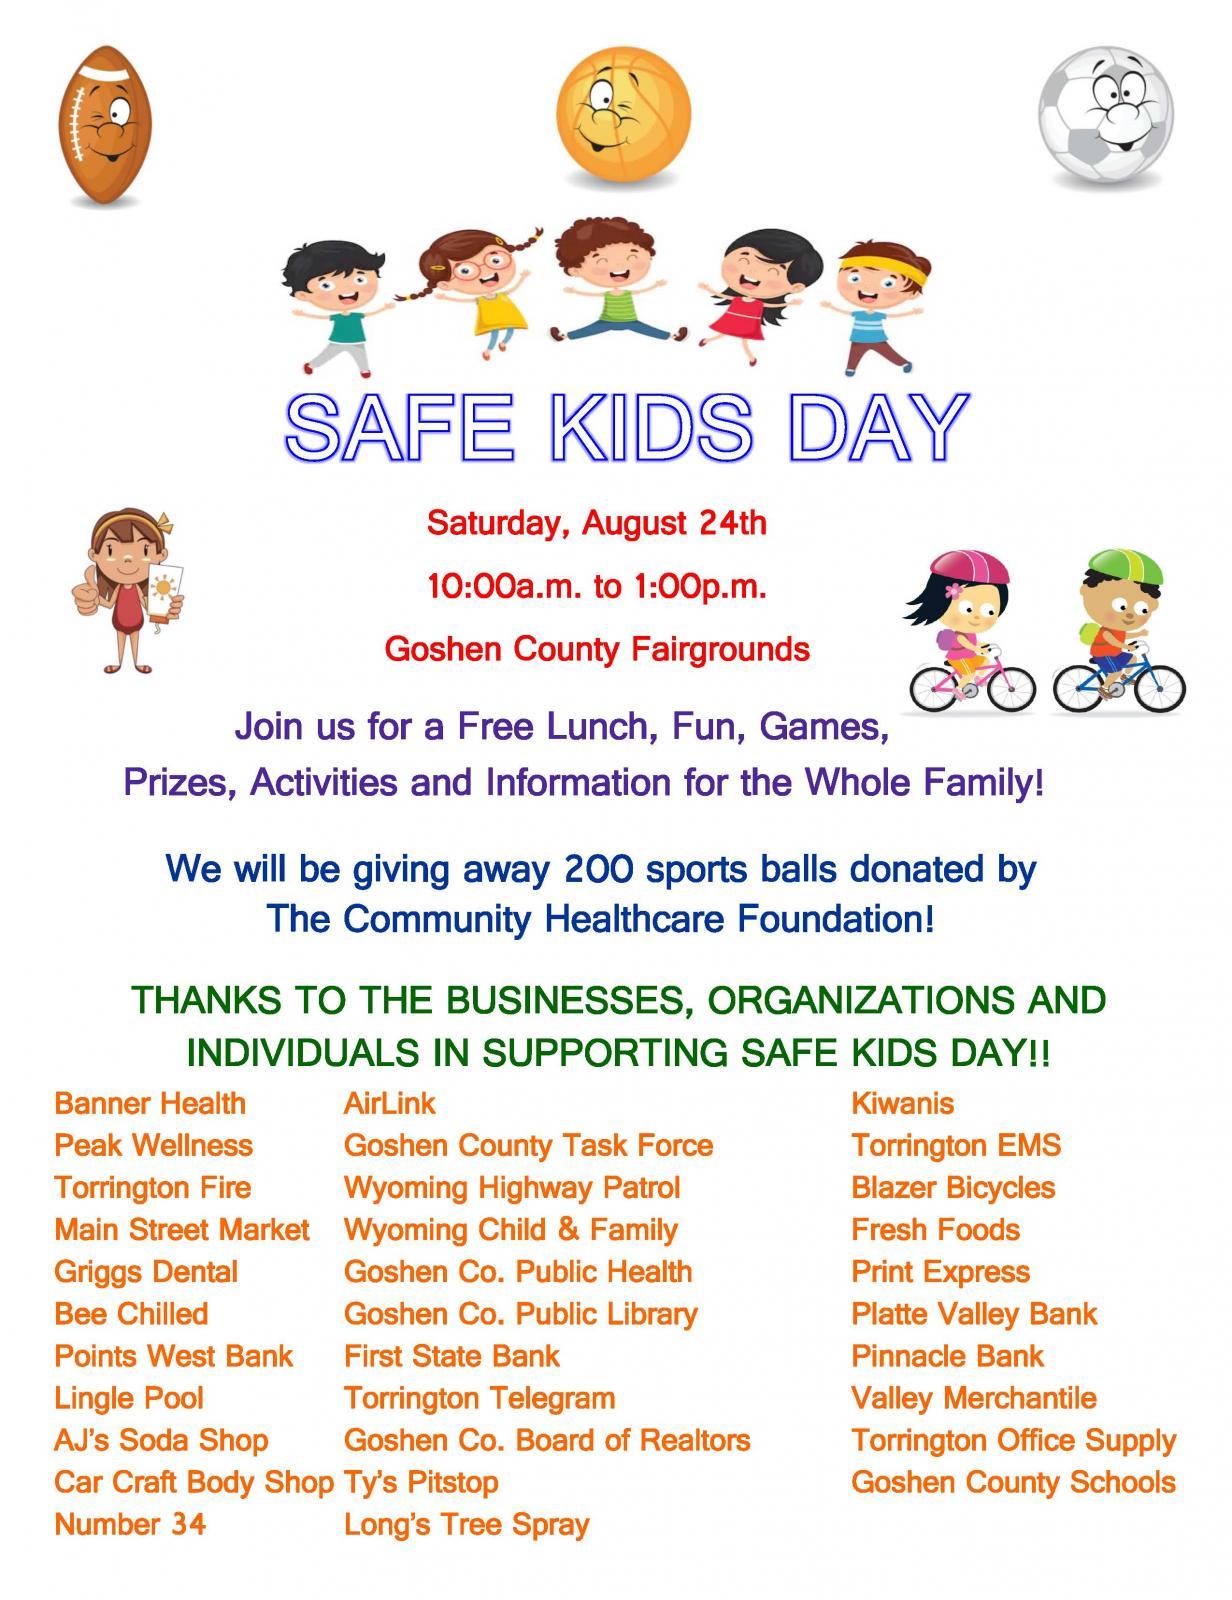 Safe kids Day Photo